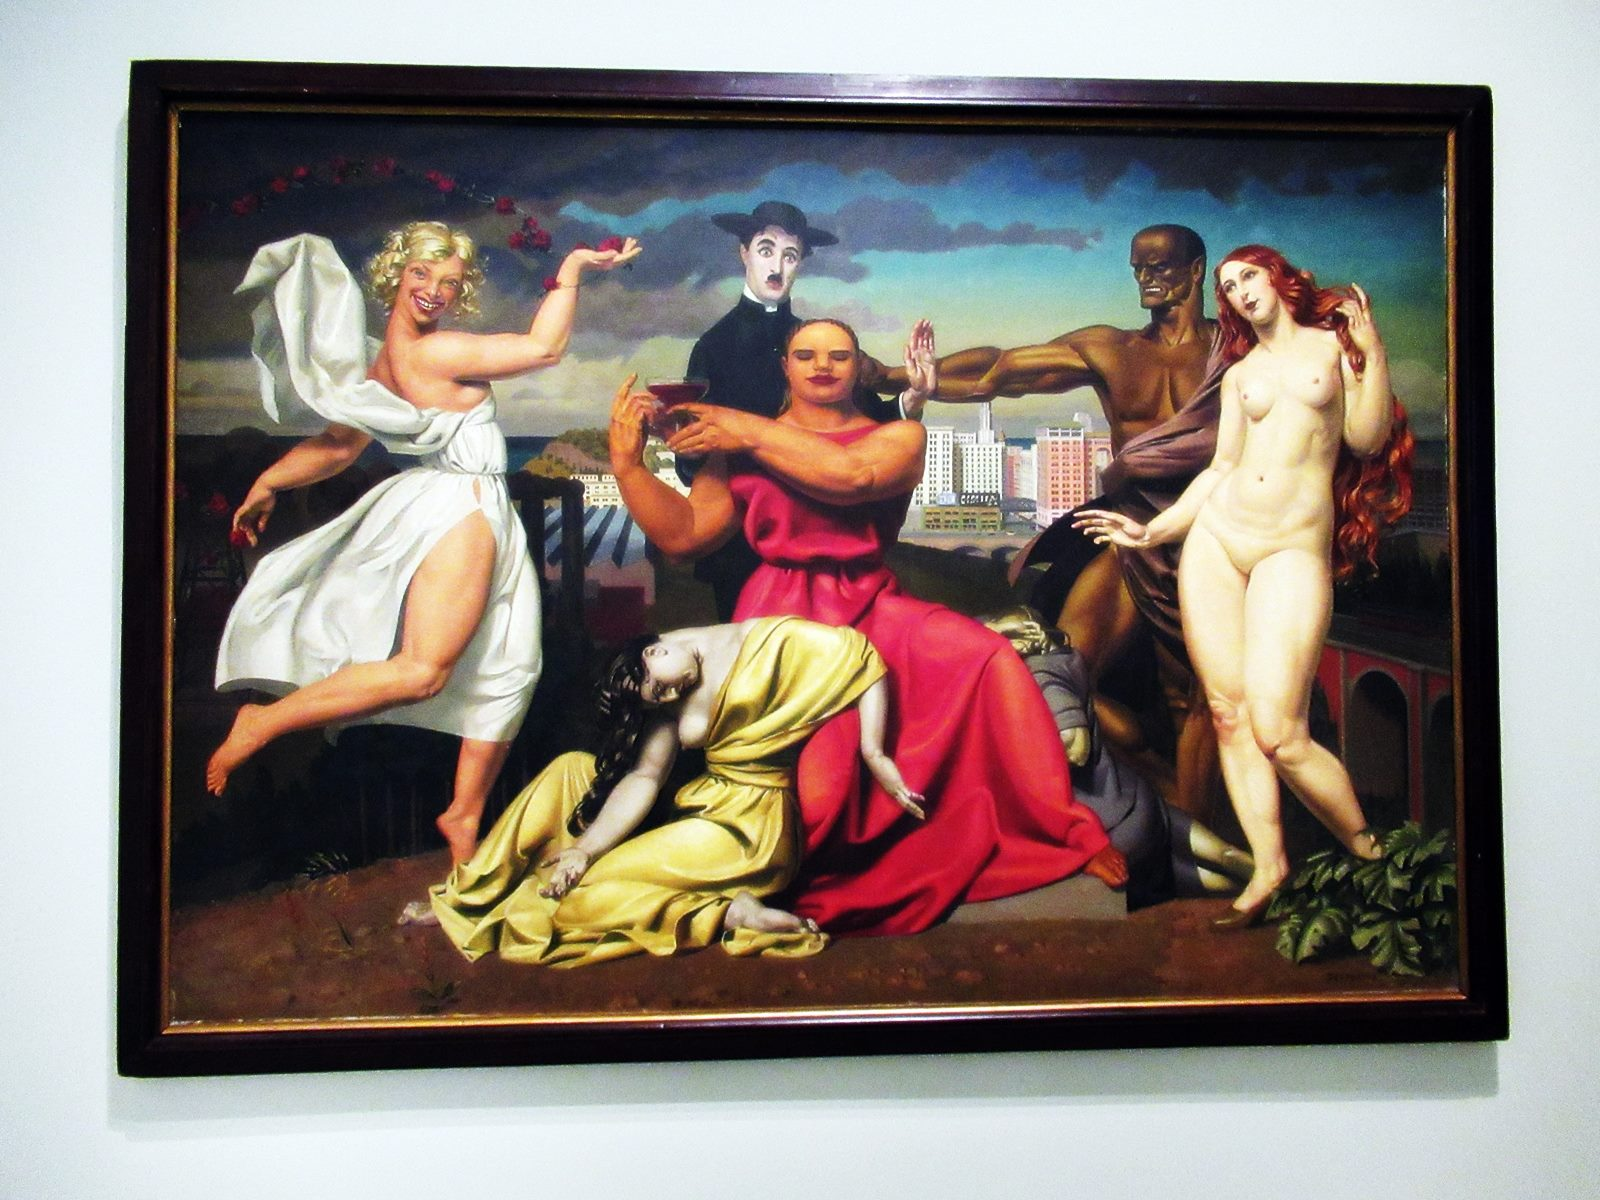 Exposition charlie chaplin nantes museeexposition charlie chaplin nantes 11